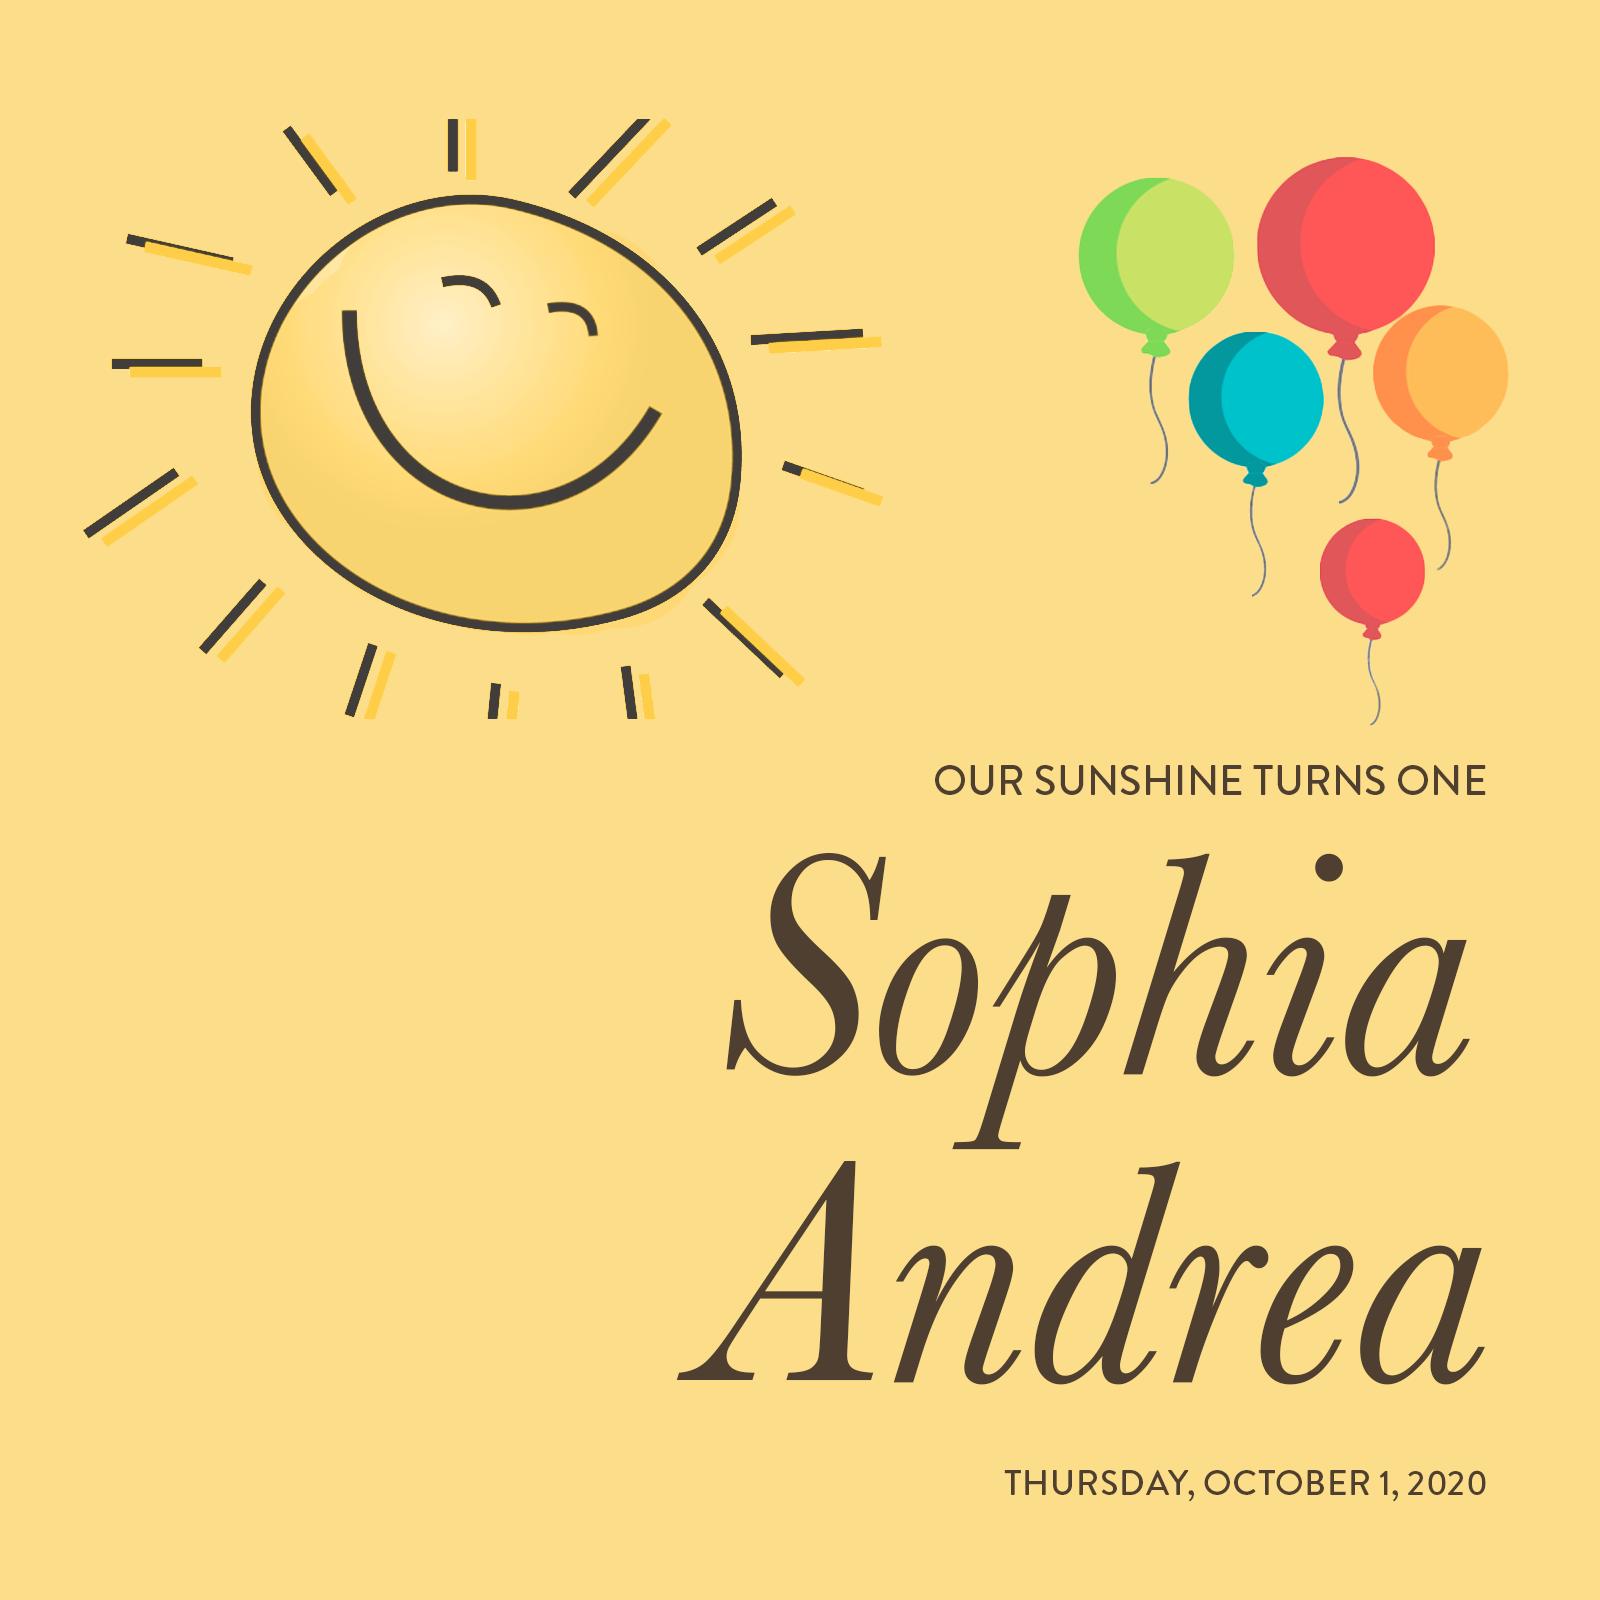 sophia andrea03_splash